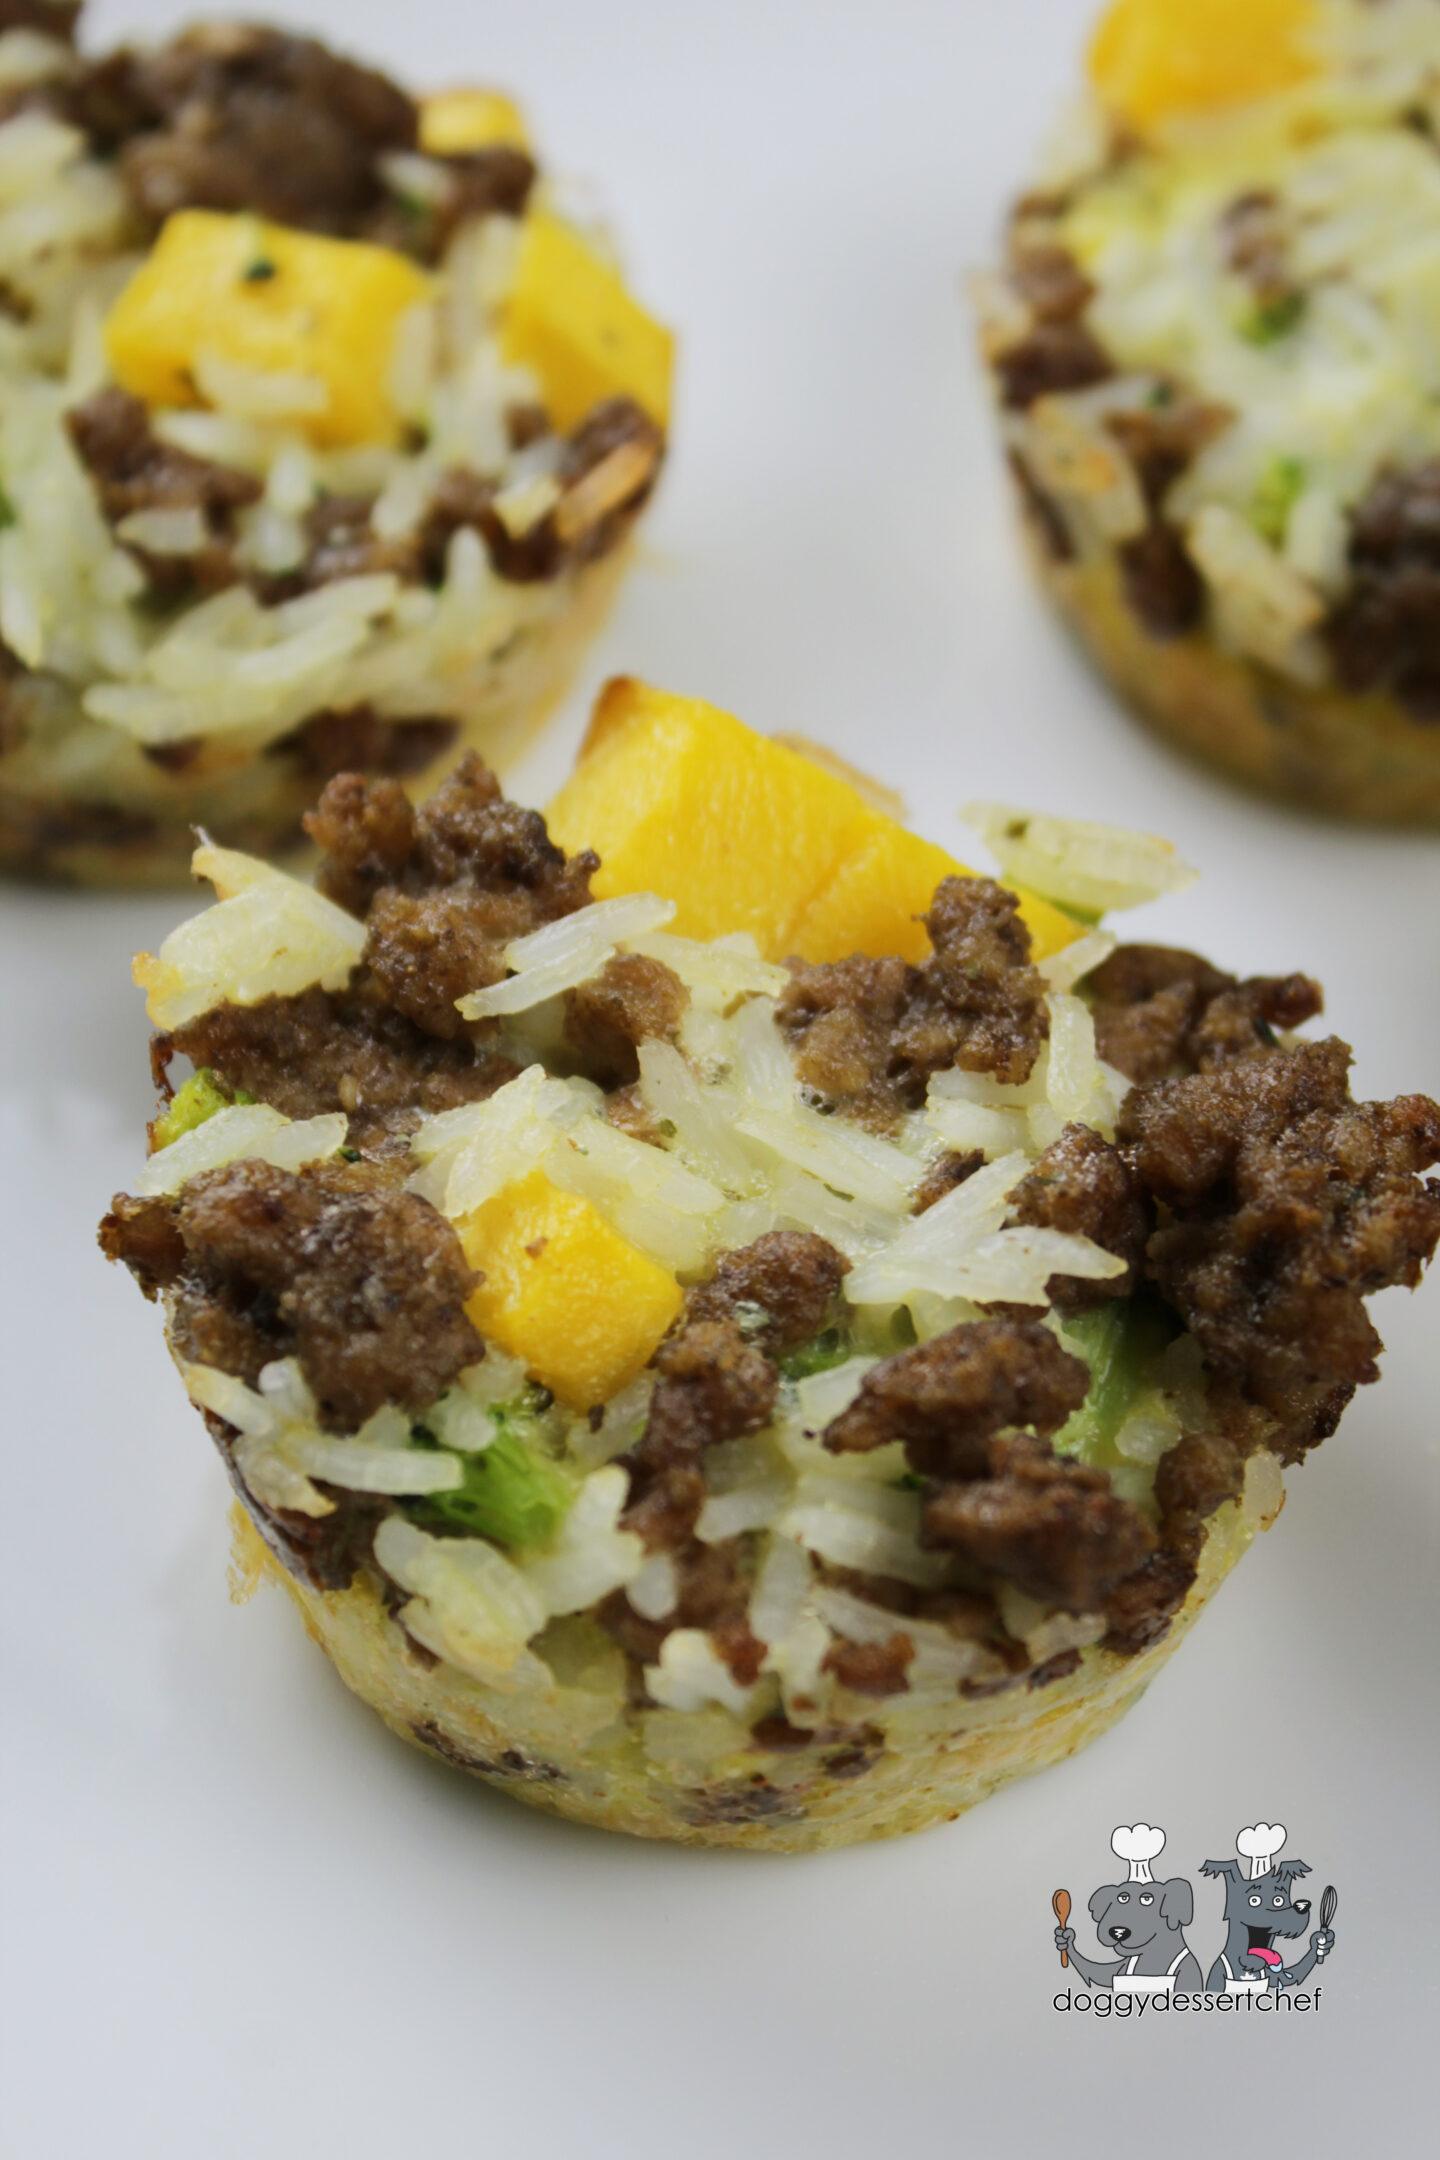 beef mango broccoli dog treat recipe